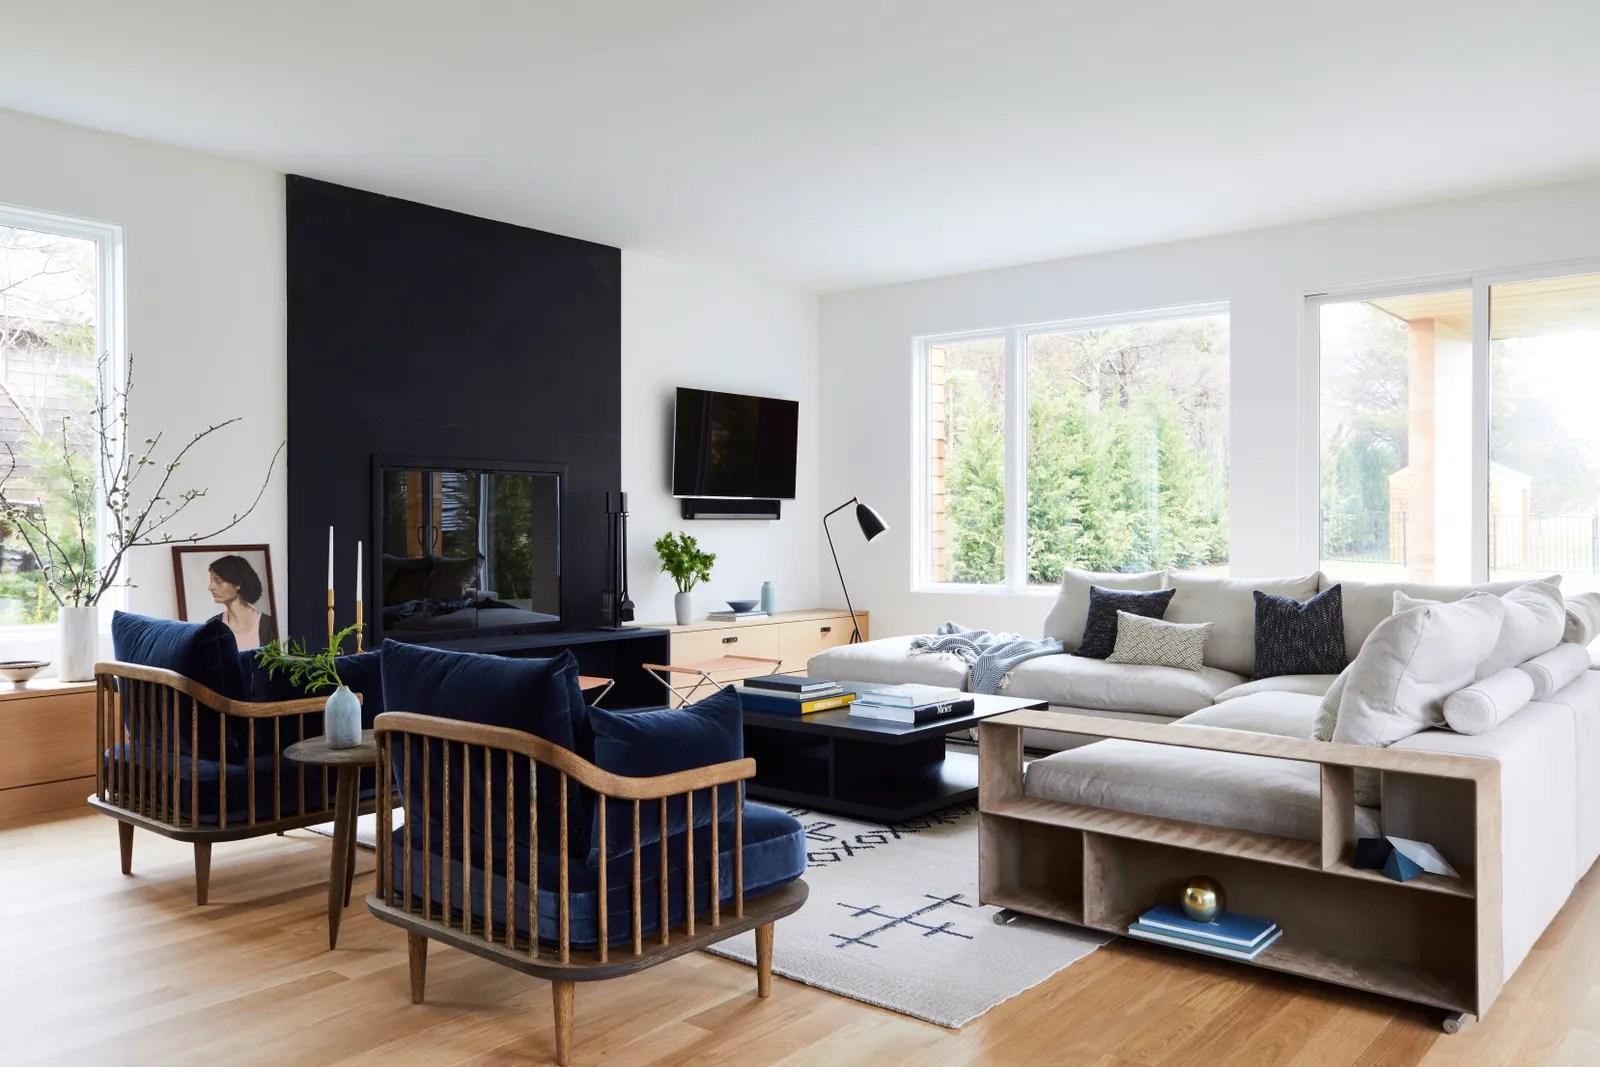 8 Living Room Furniture Ideas For Design Inspiration Architectural Digest